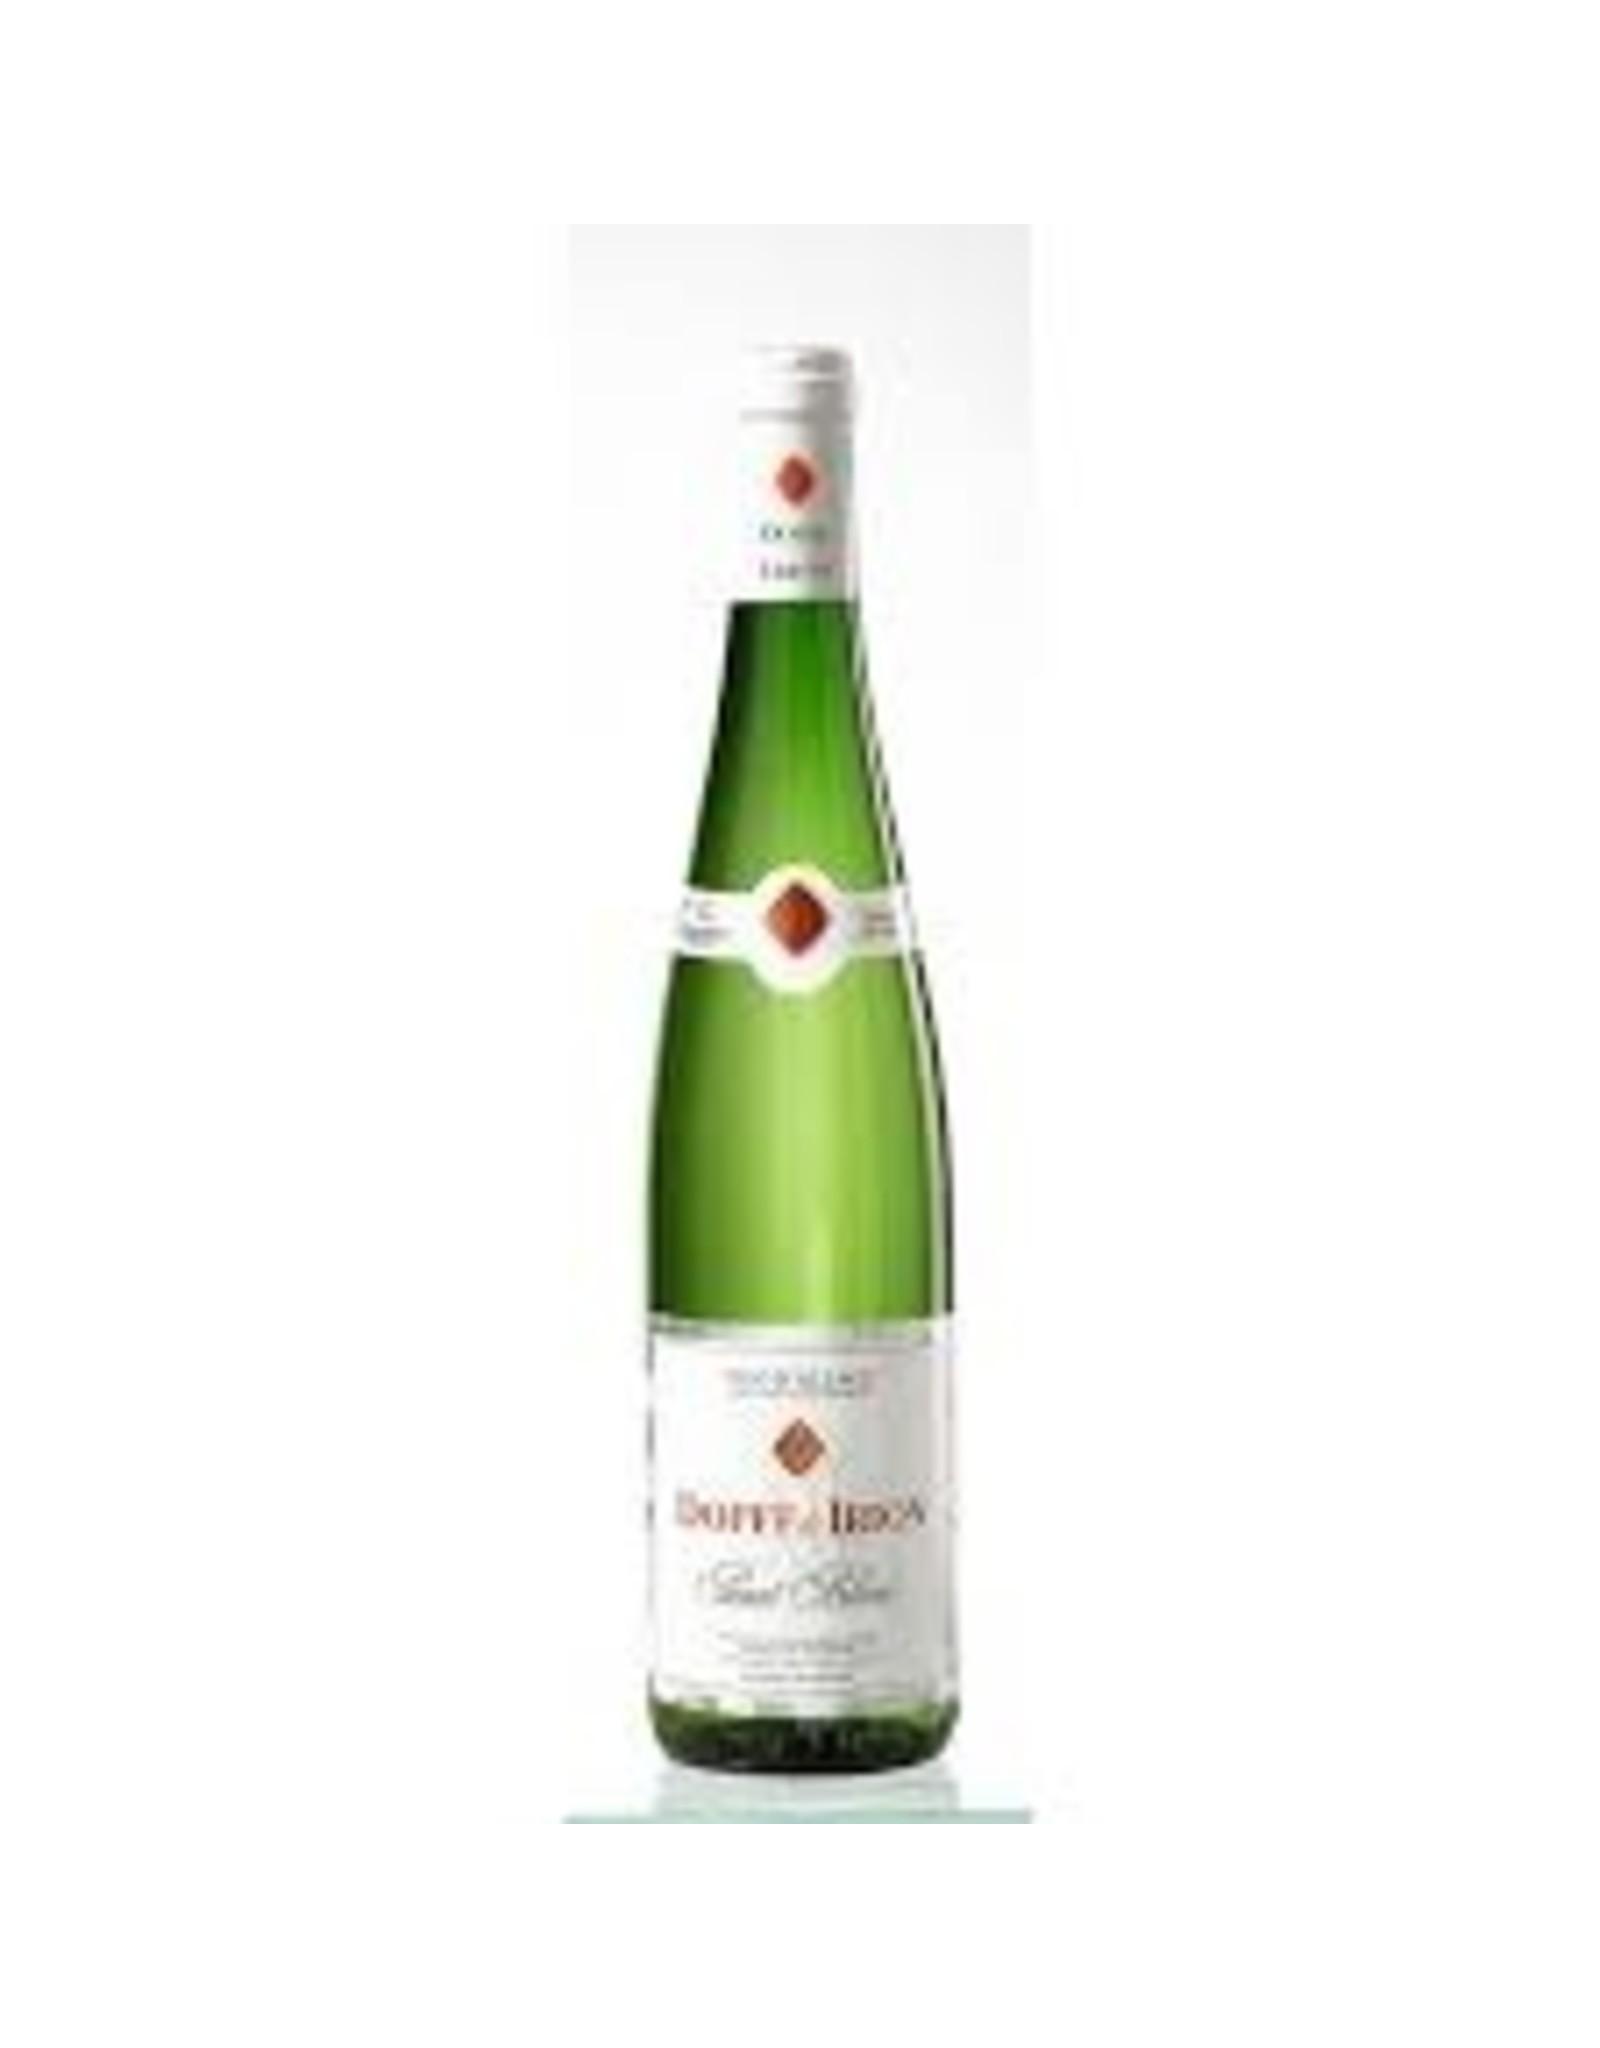 Dopff Irion Pinot Blanc